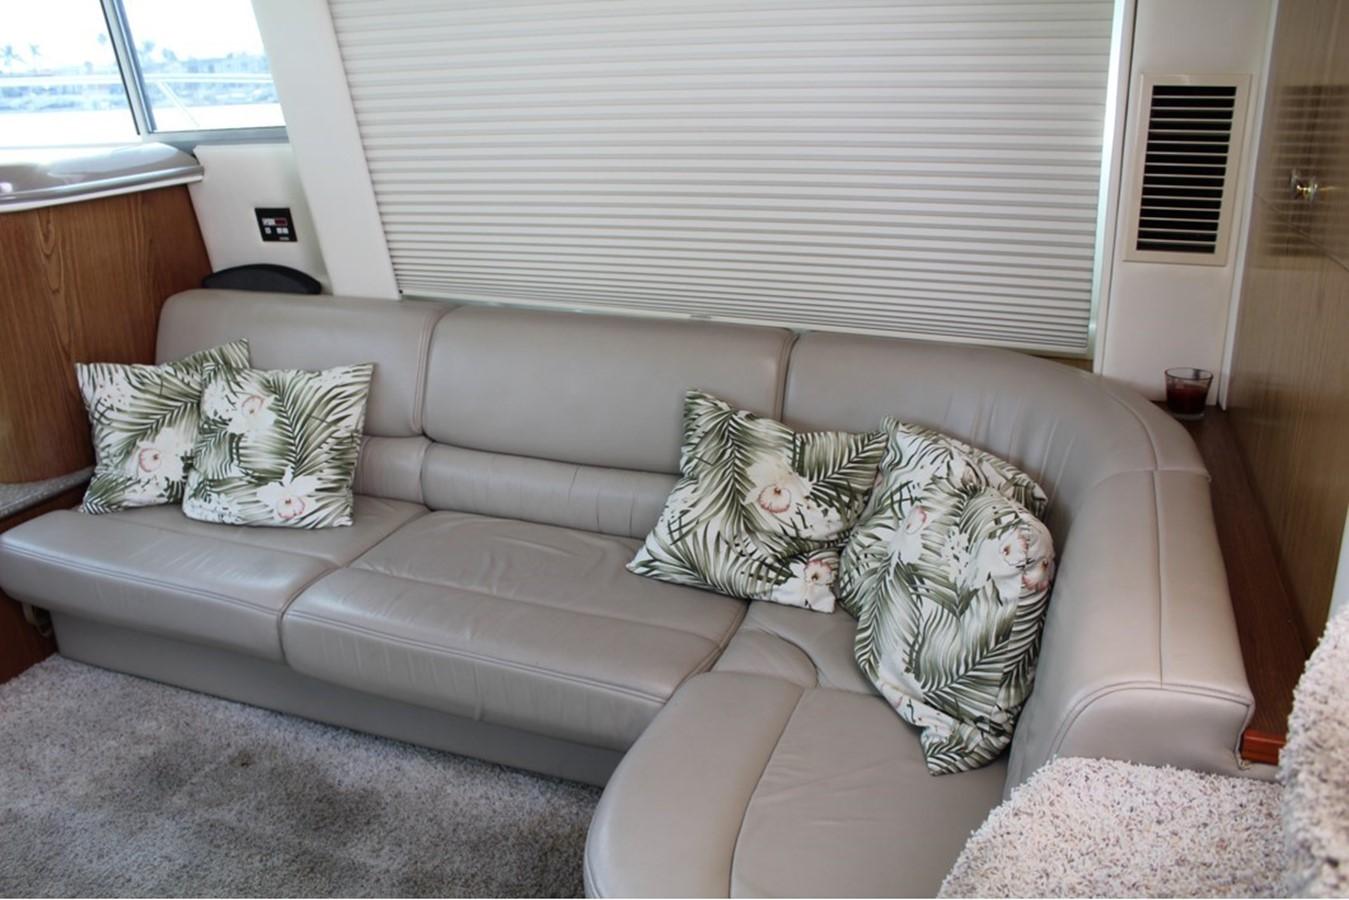 Salon 1998 MAXUM 4100 SCA Motor Yacht 2491286